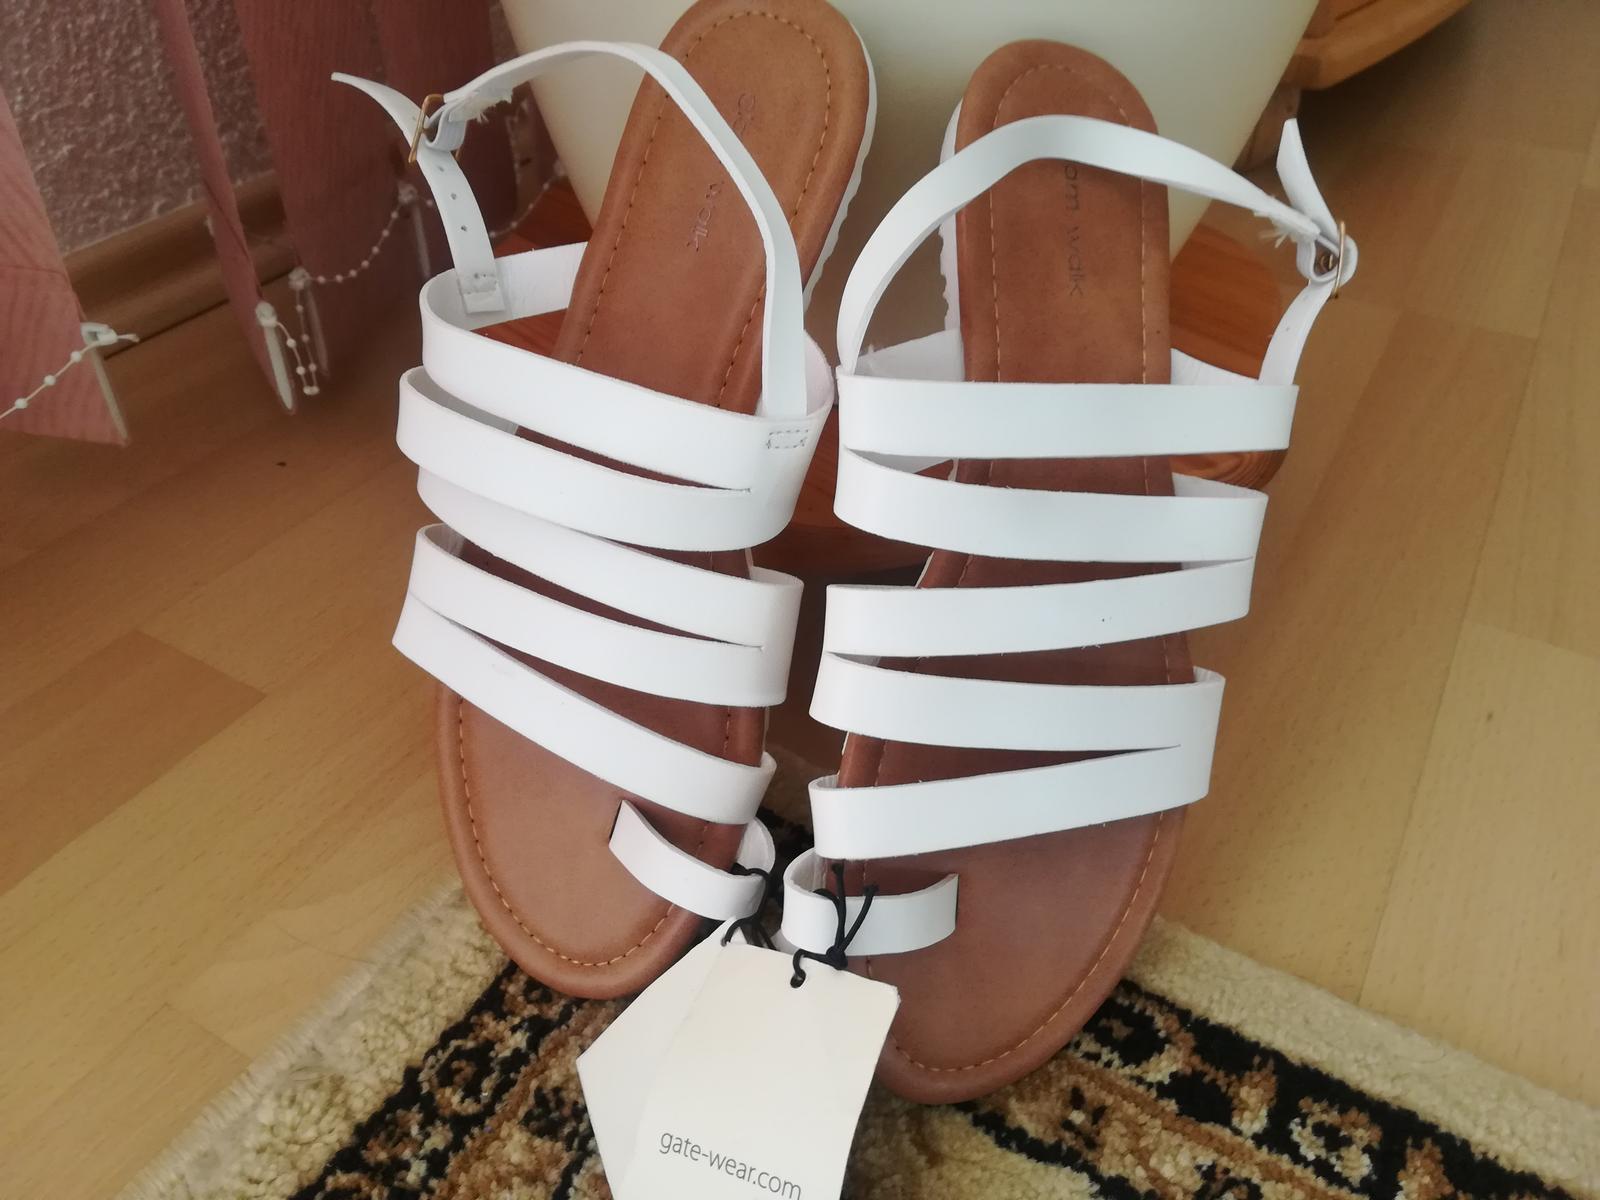 Sandálky  - Obrázek č. 2